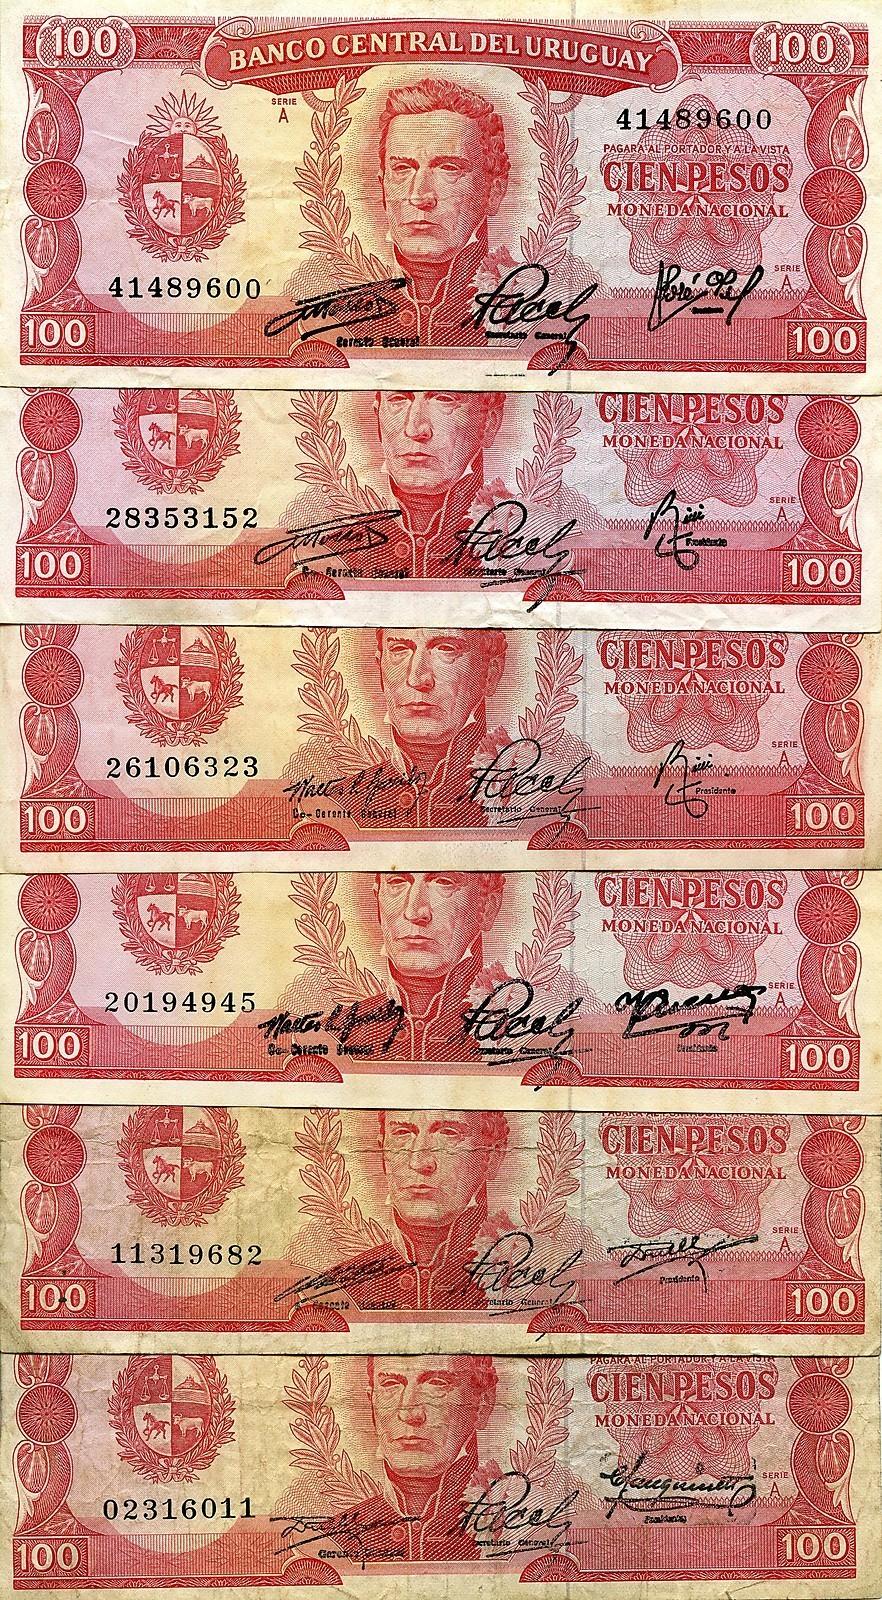 100 Pesos Uruguay, 1967 ? 00001